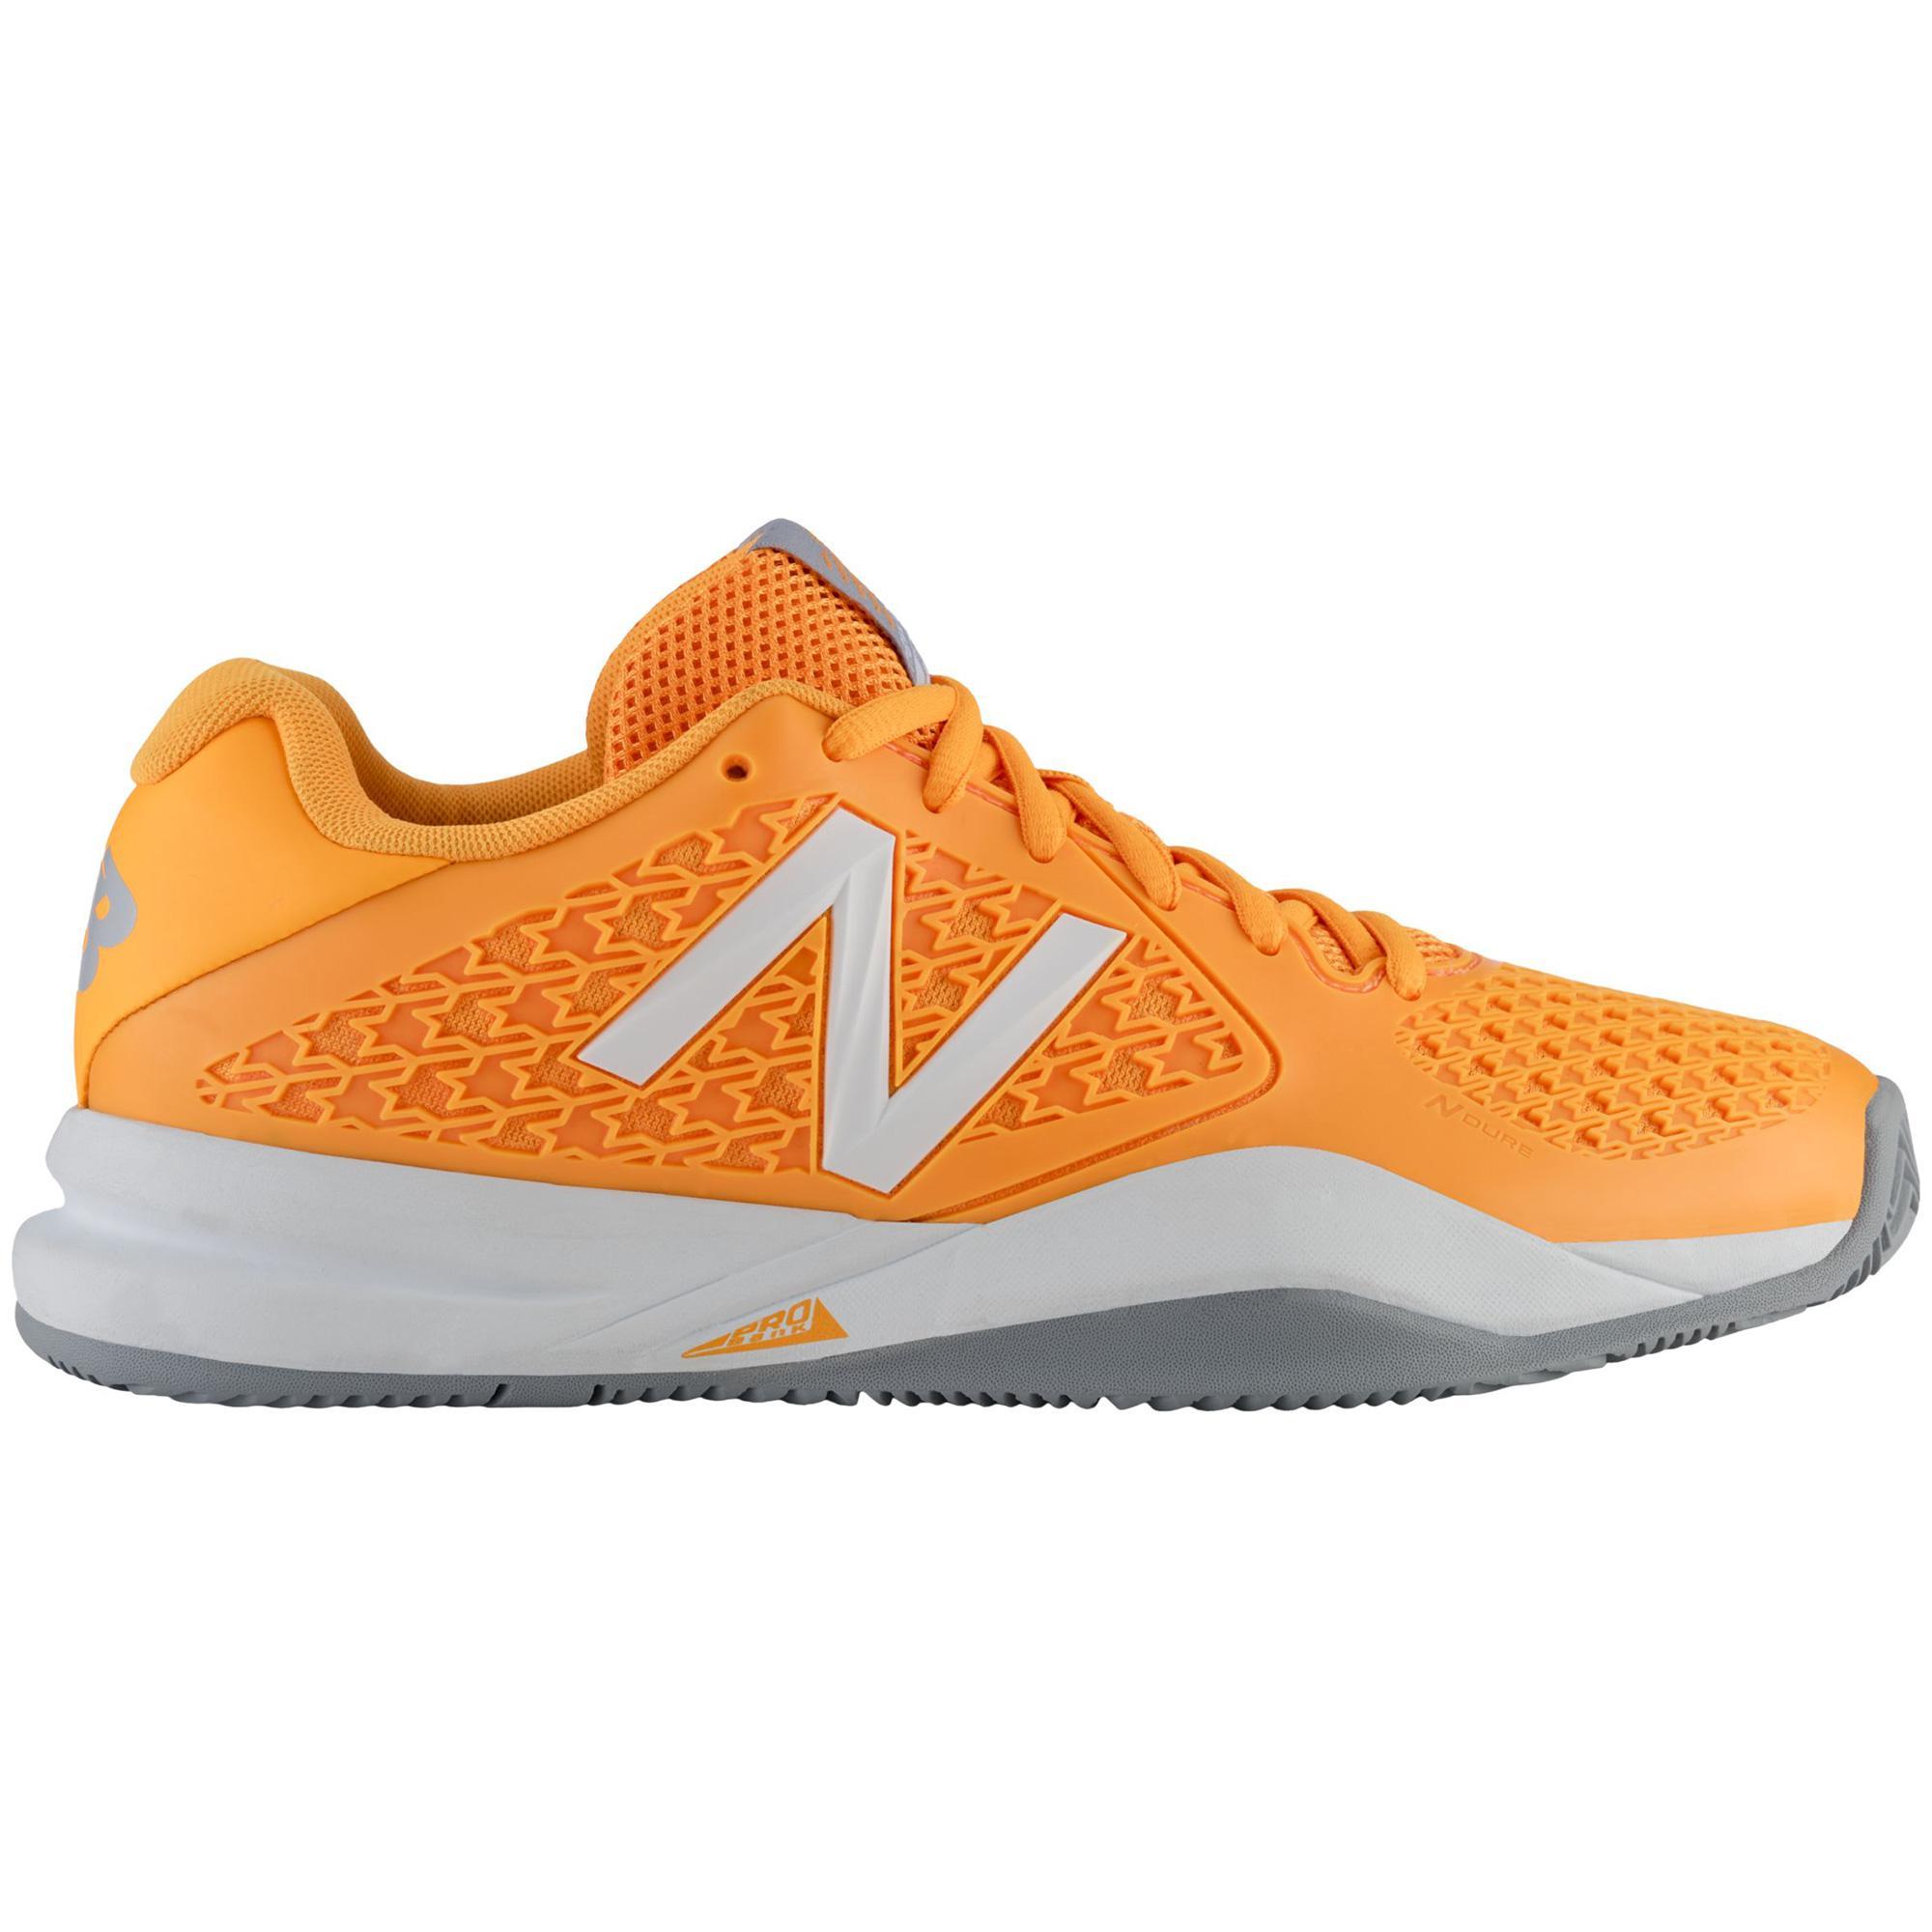 pacífico Desobediencia Falsificación  New Balance Womens 996v2 Tennis Shoes - Orange (B) - Tennisnuts.com